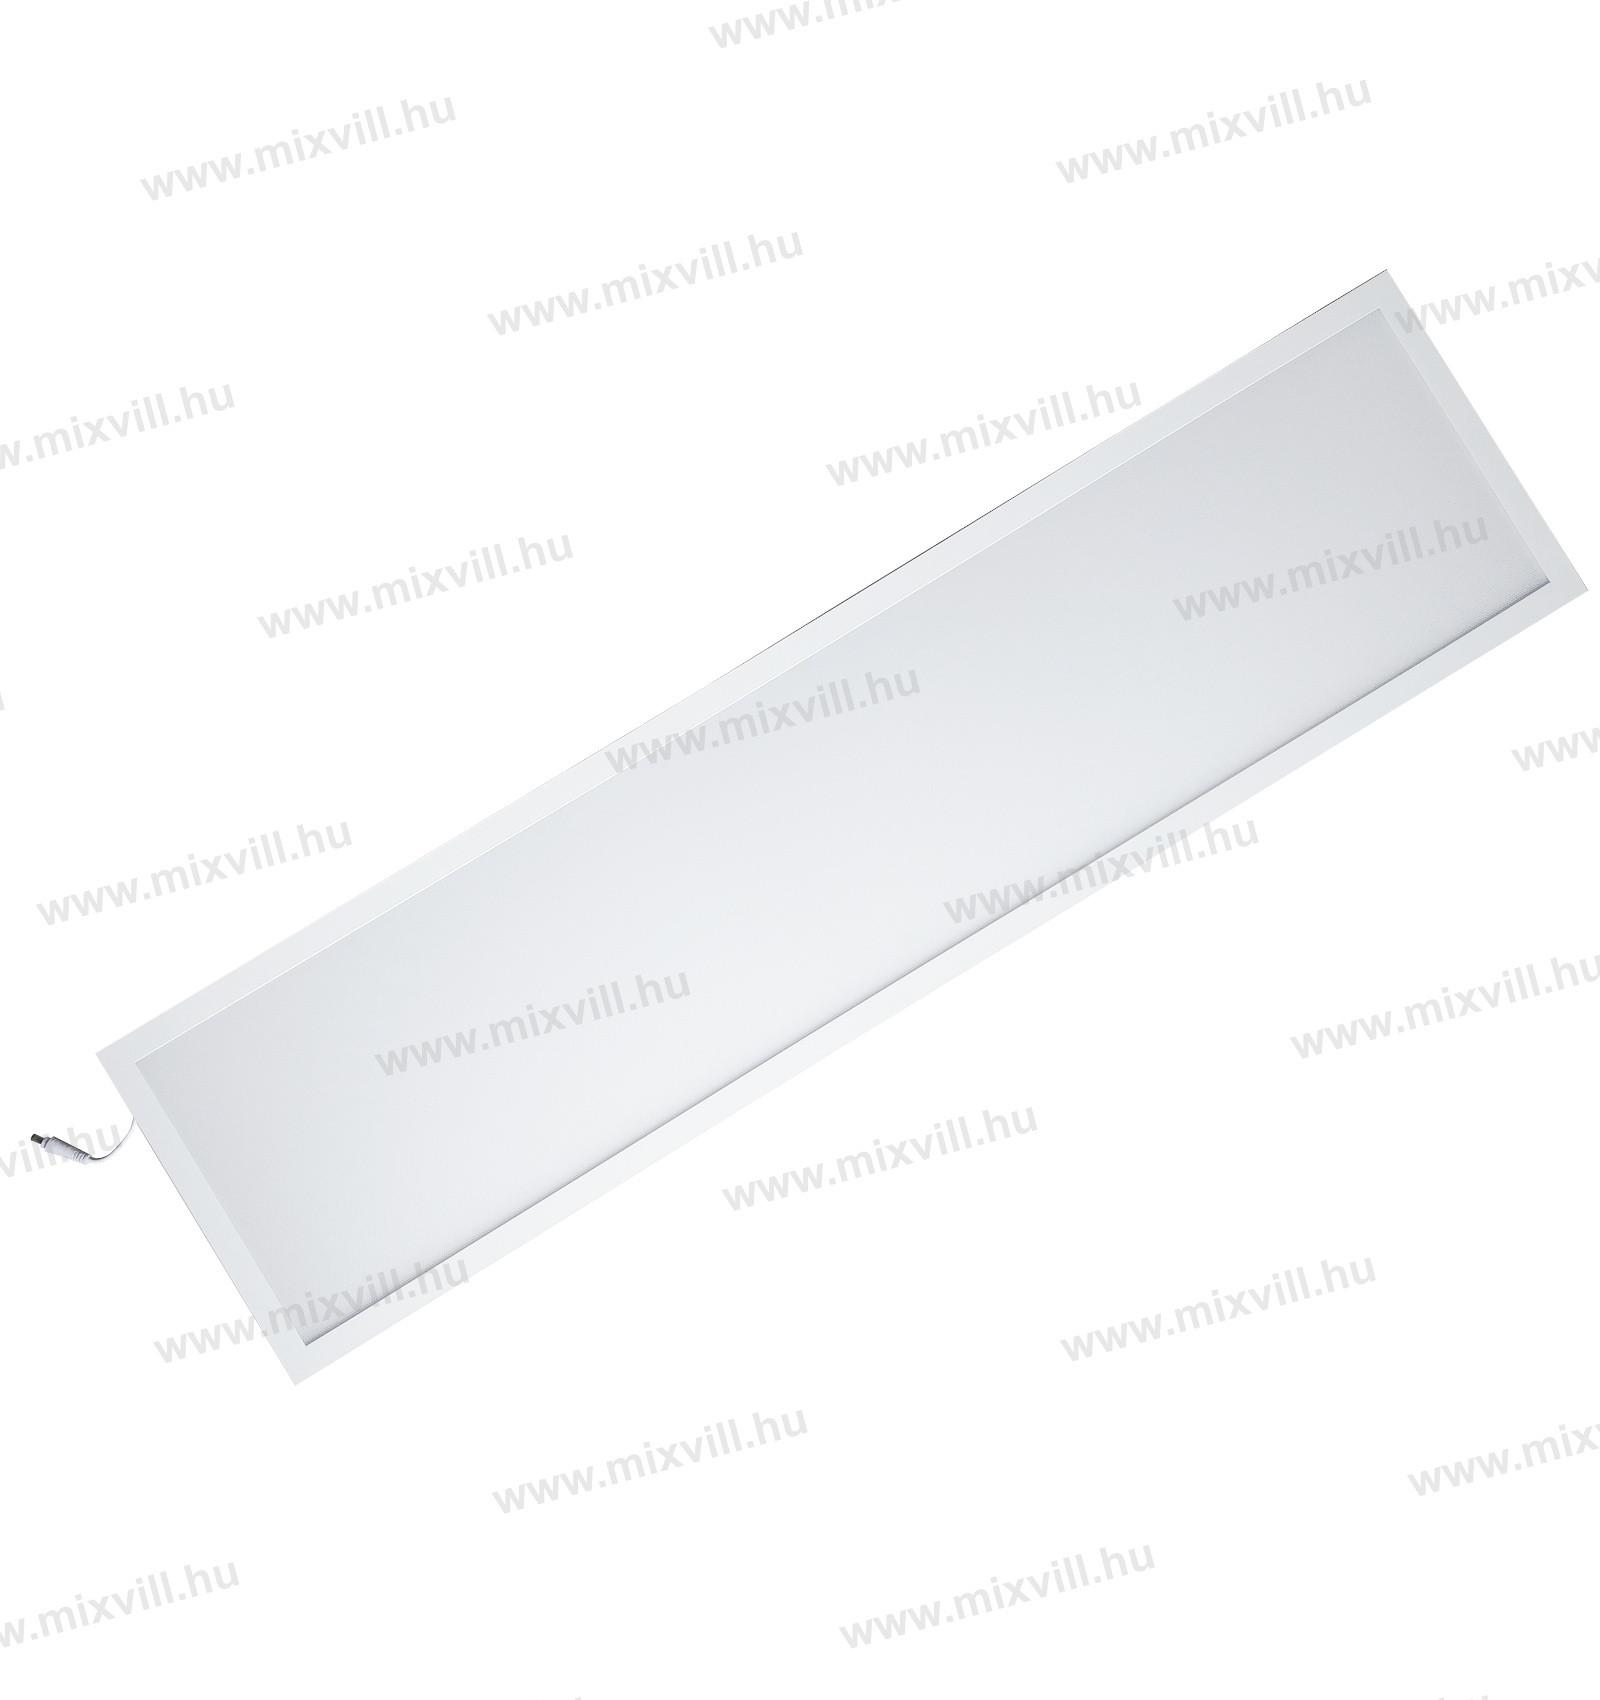 Omu_lighting_plugr40123_120x30cm_led_panel_almennyezet_3000K